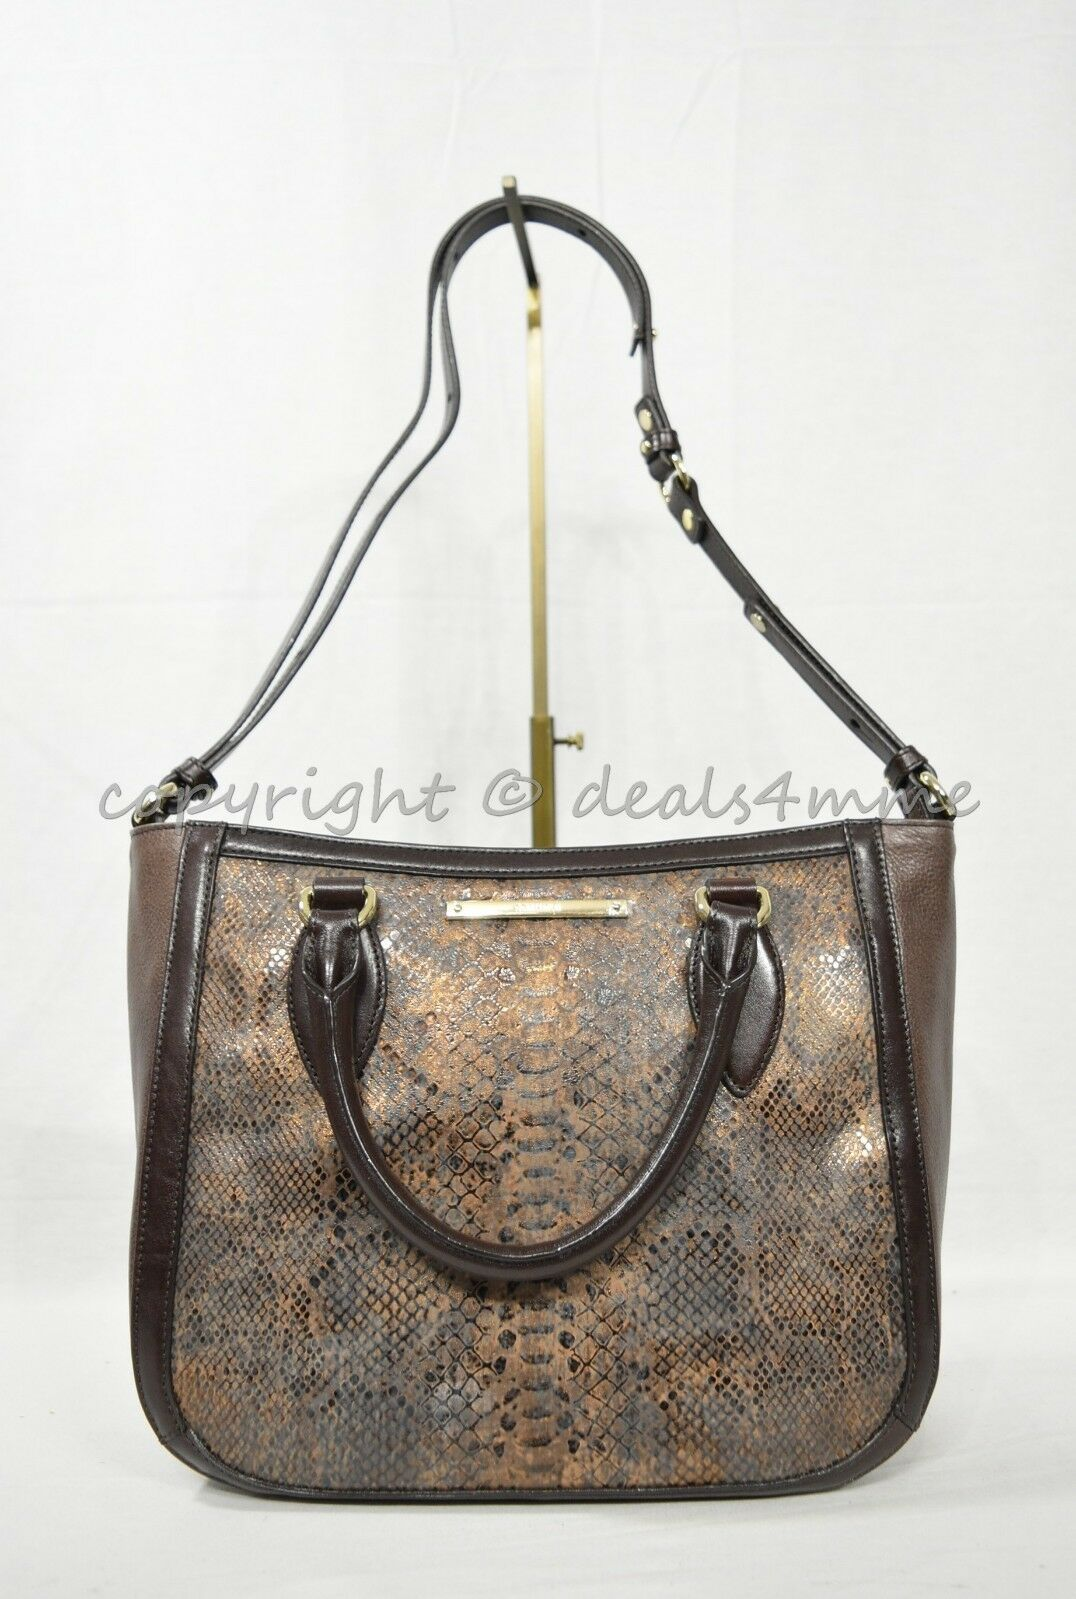 NWT Brahmin Small Lena Leather Satchel/Shoulder Bag in Brown Barrow image 2